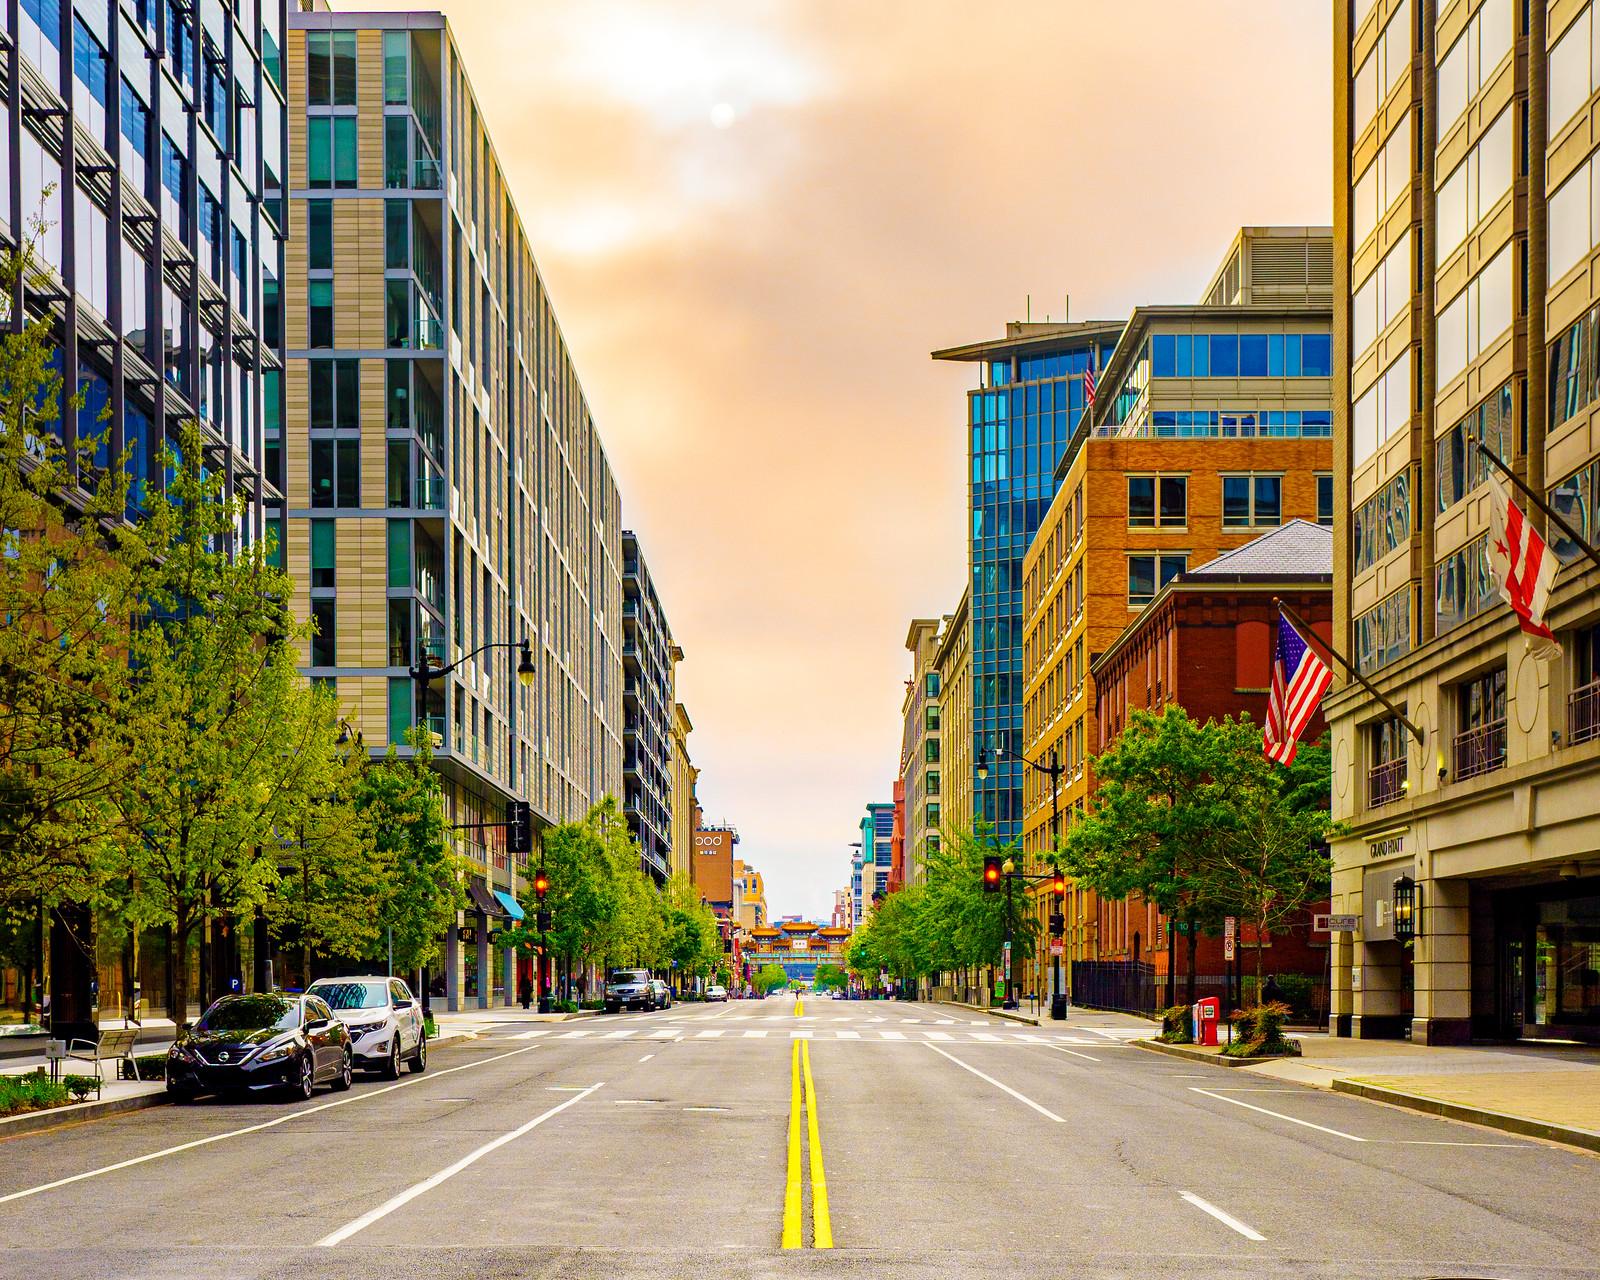 2020.04.25 DC People and Places, Washington, DC USA 116 17207